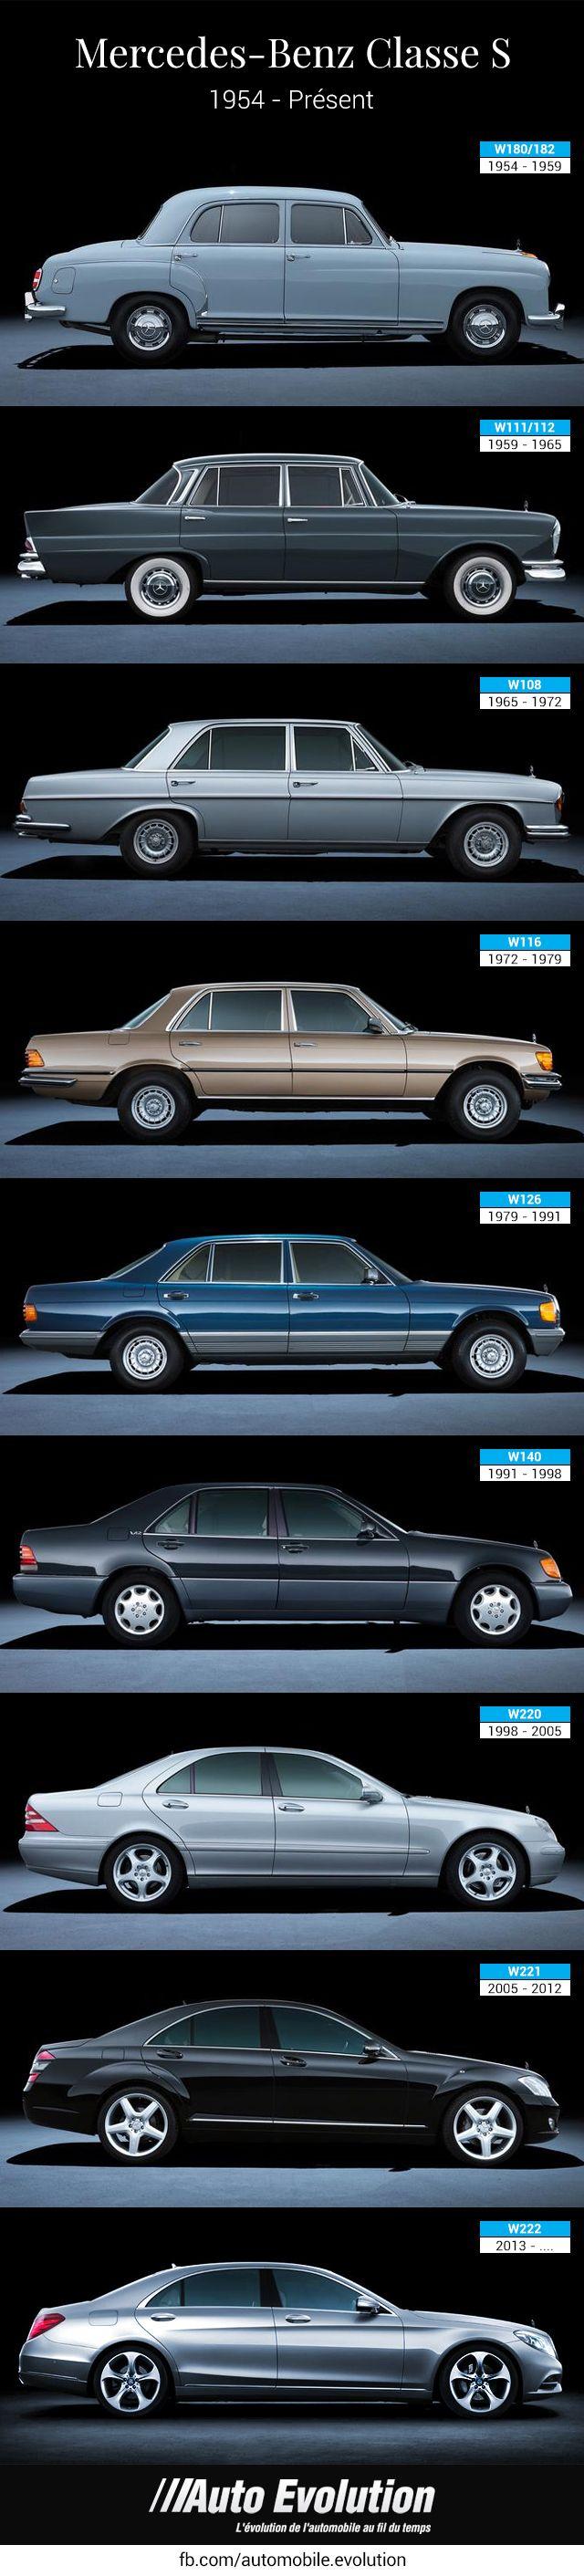 Mercedes Benz Classe S S class evolution